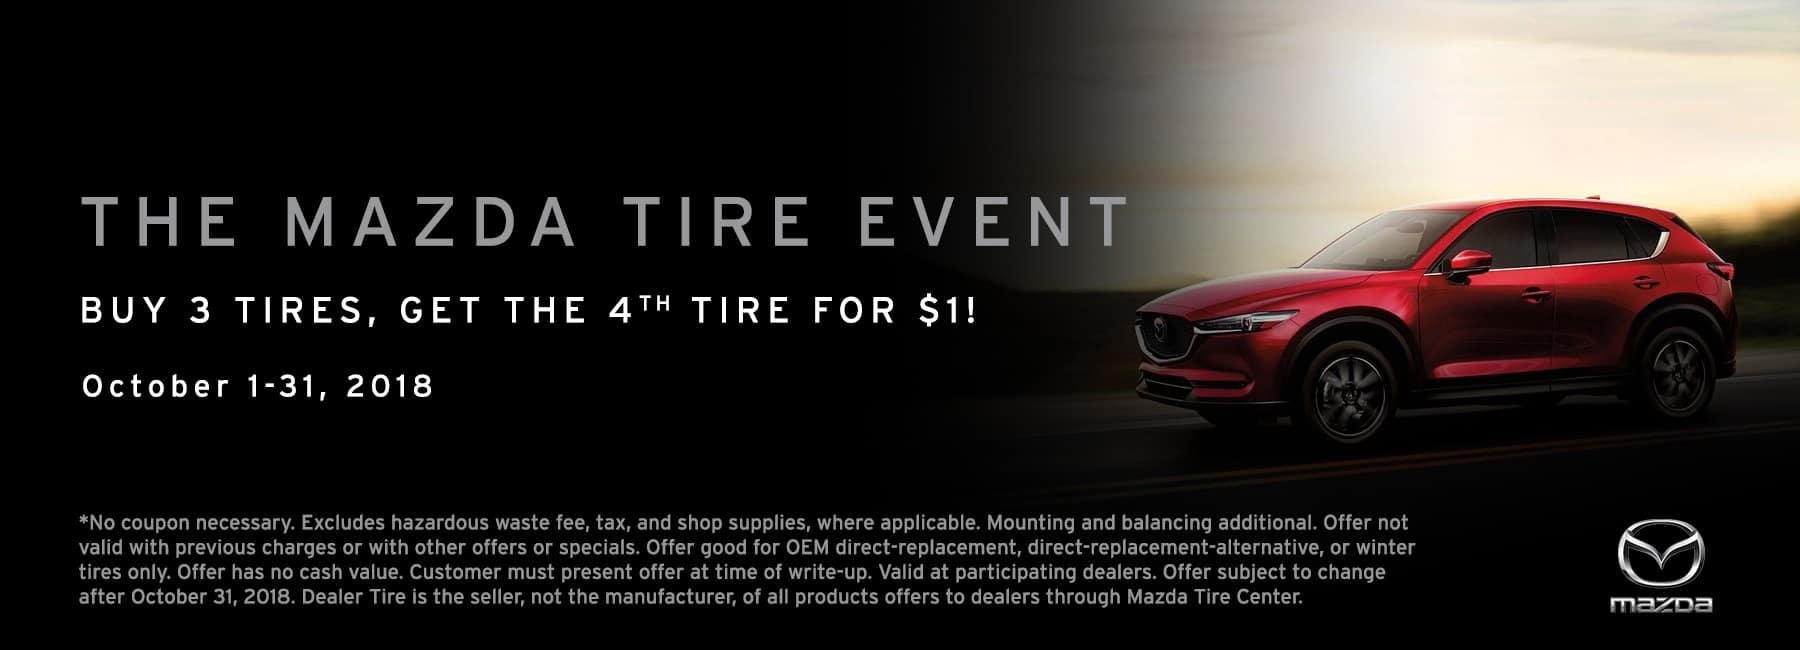 October 2018 Mazda Tire Event